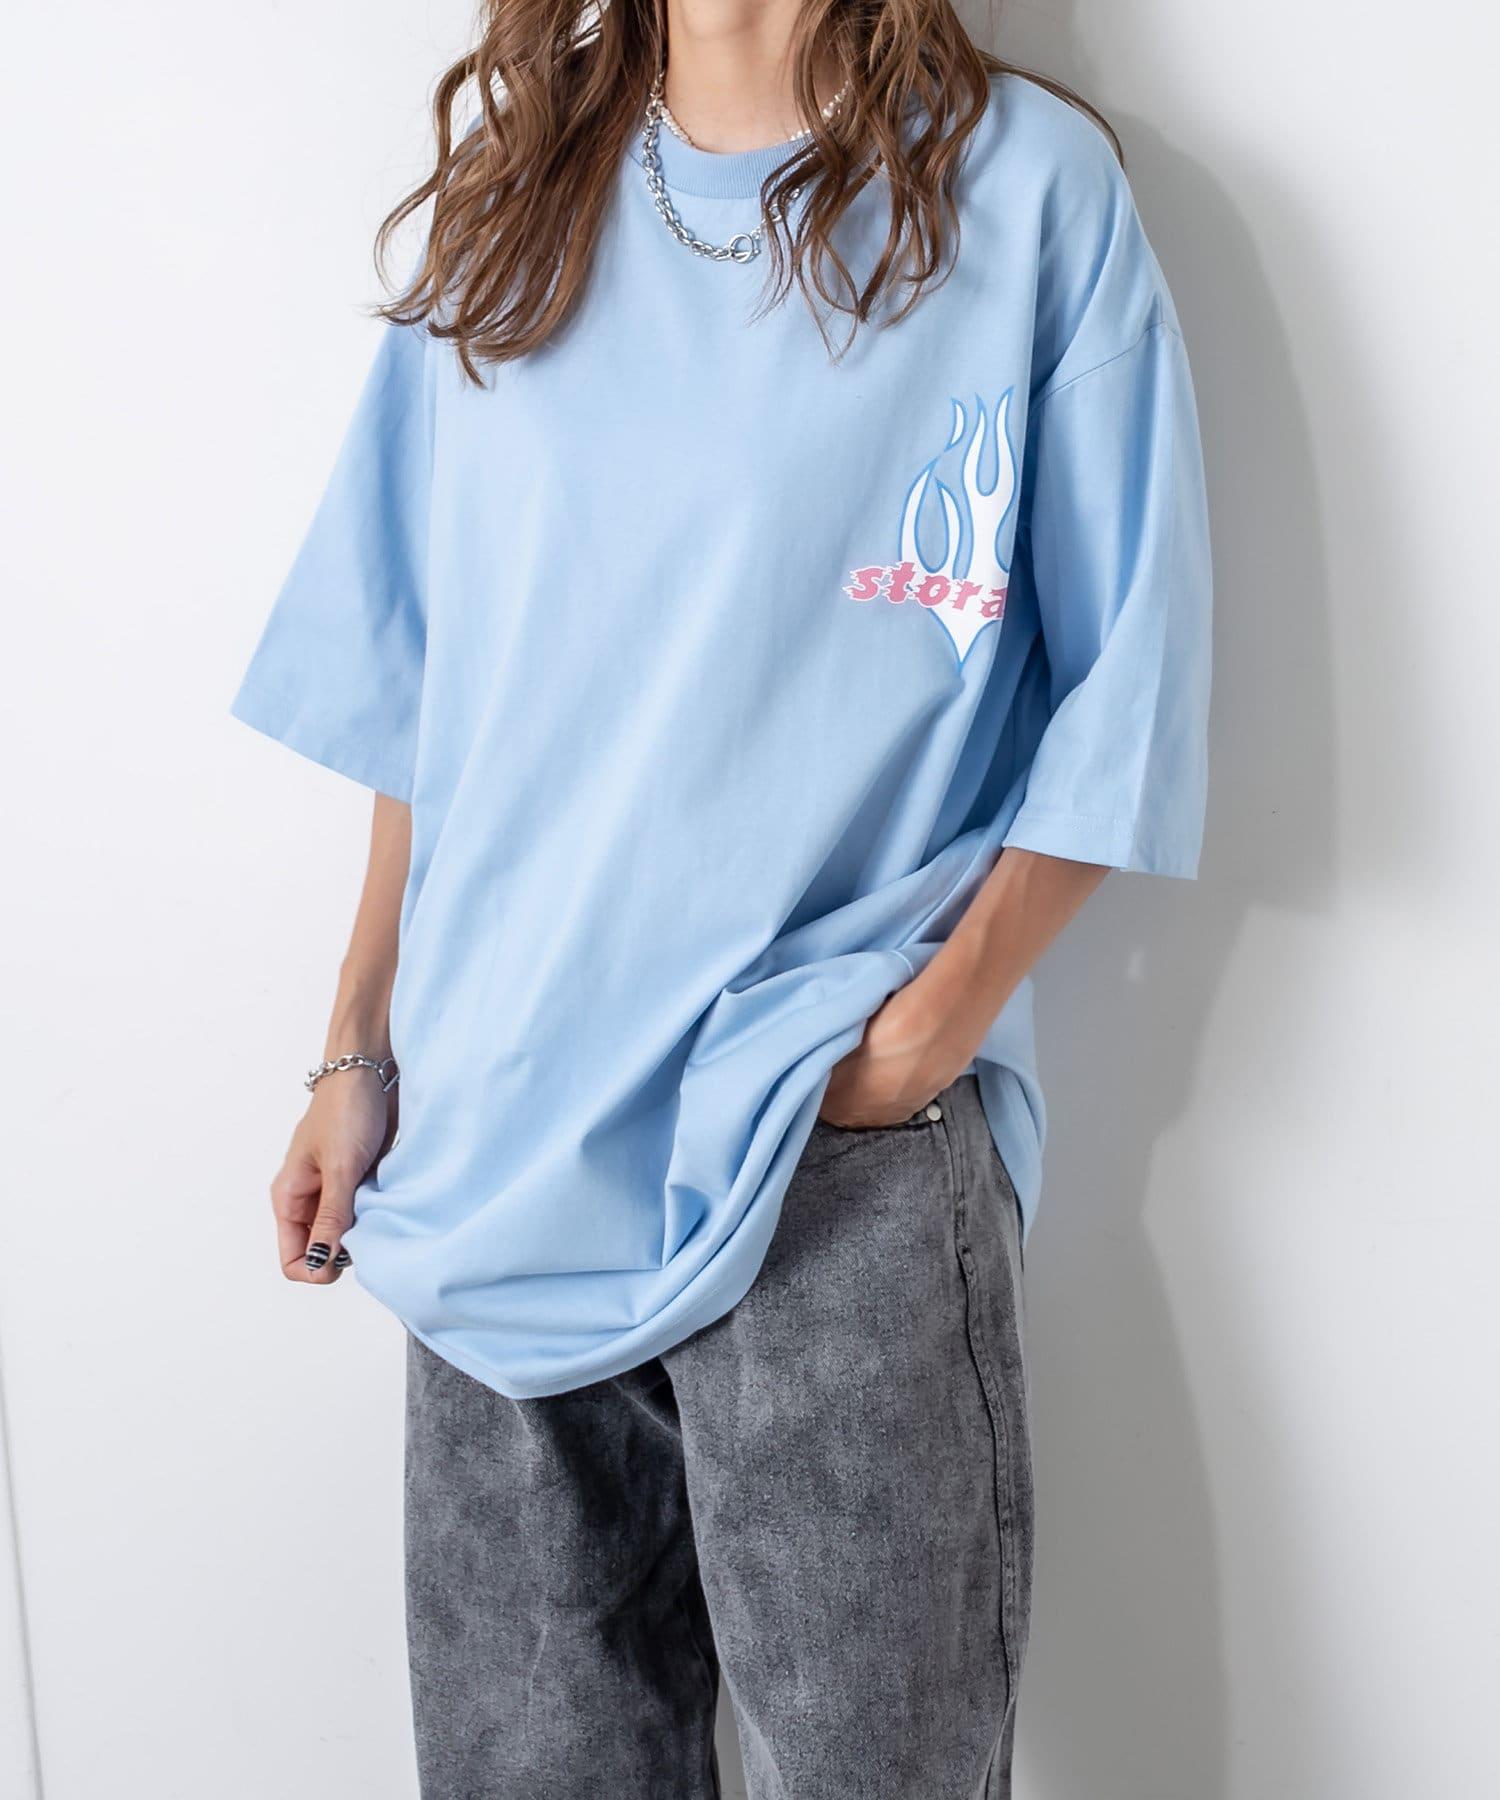 RASVOA(ラスボア) レディース ファイヤーストレージTシャツ サックスブルー